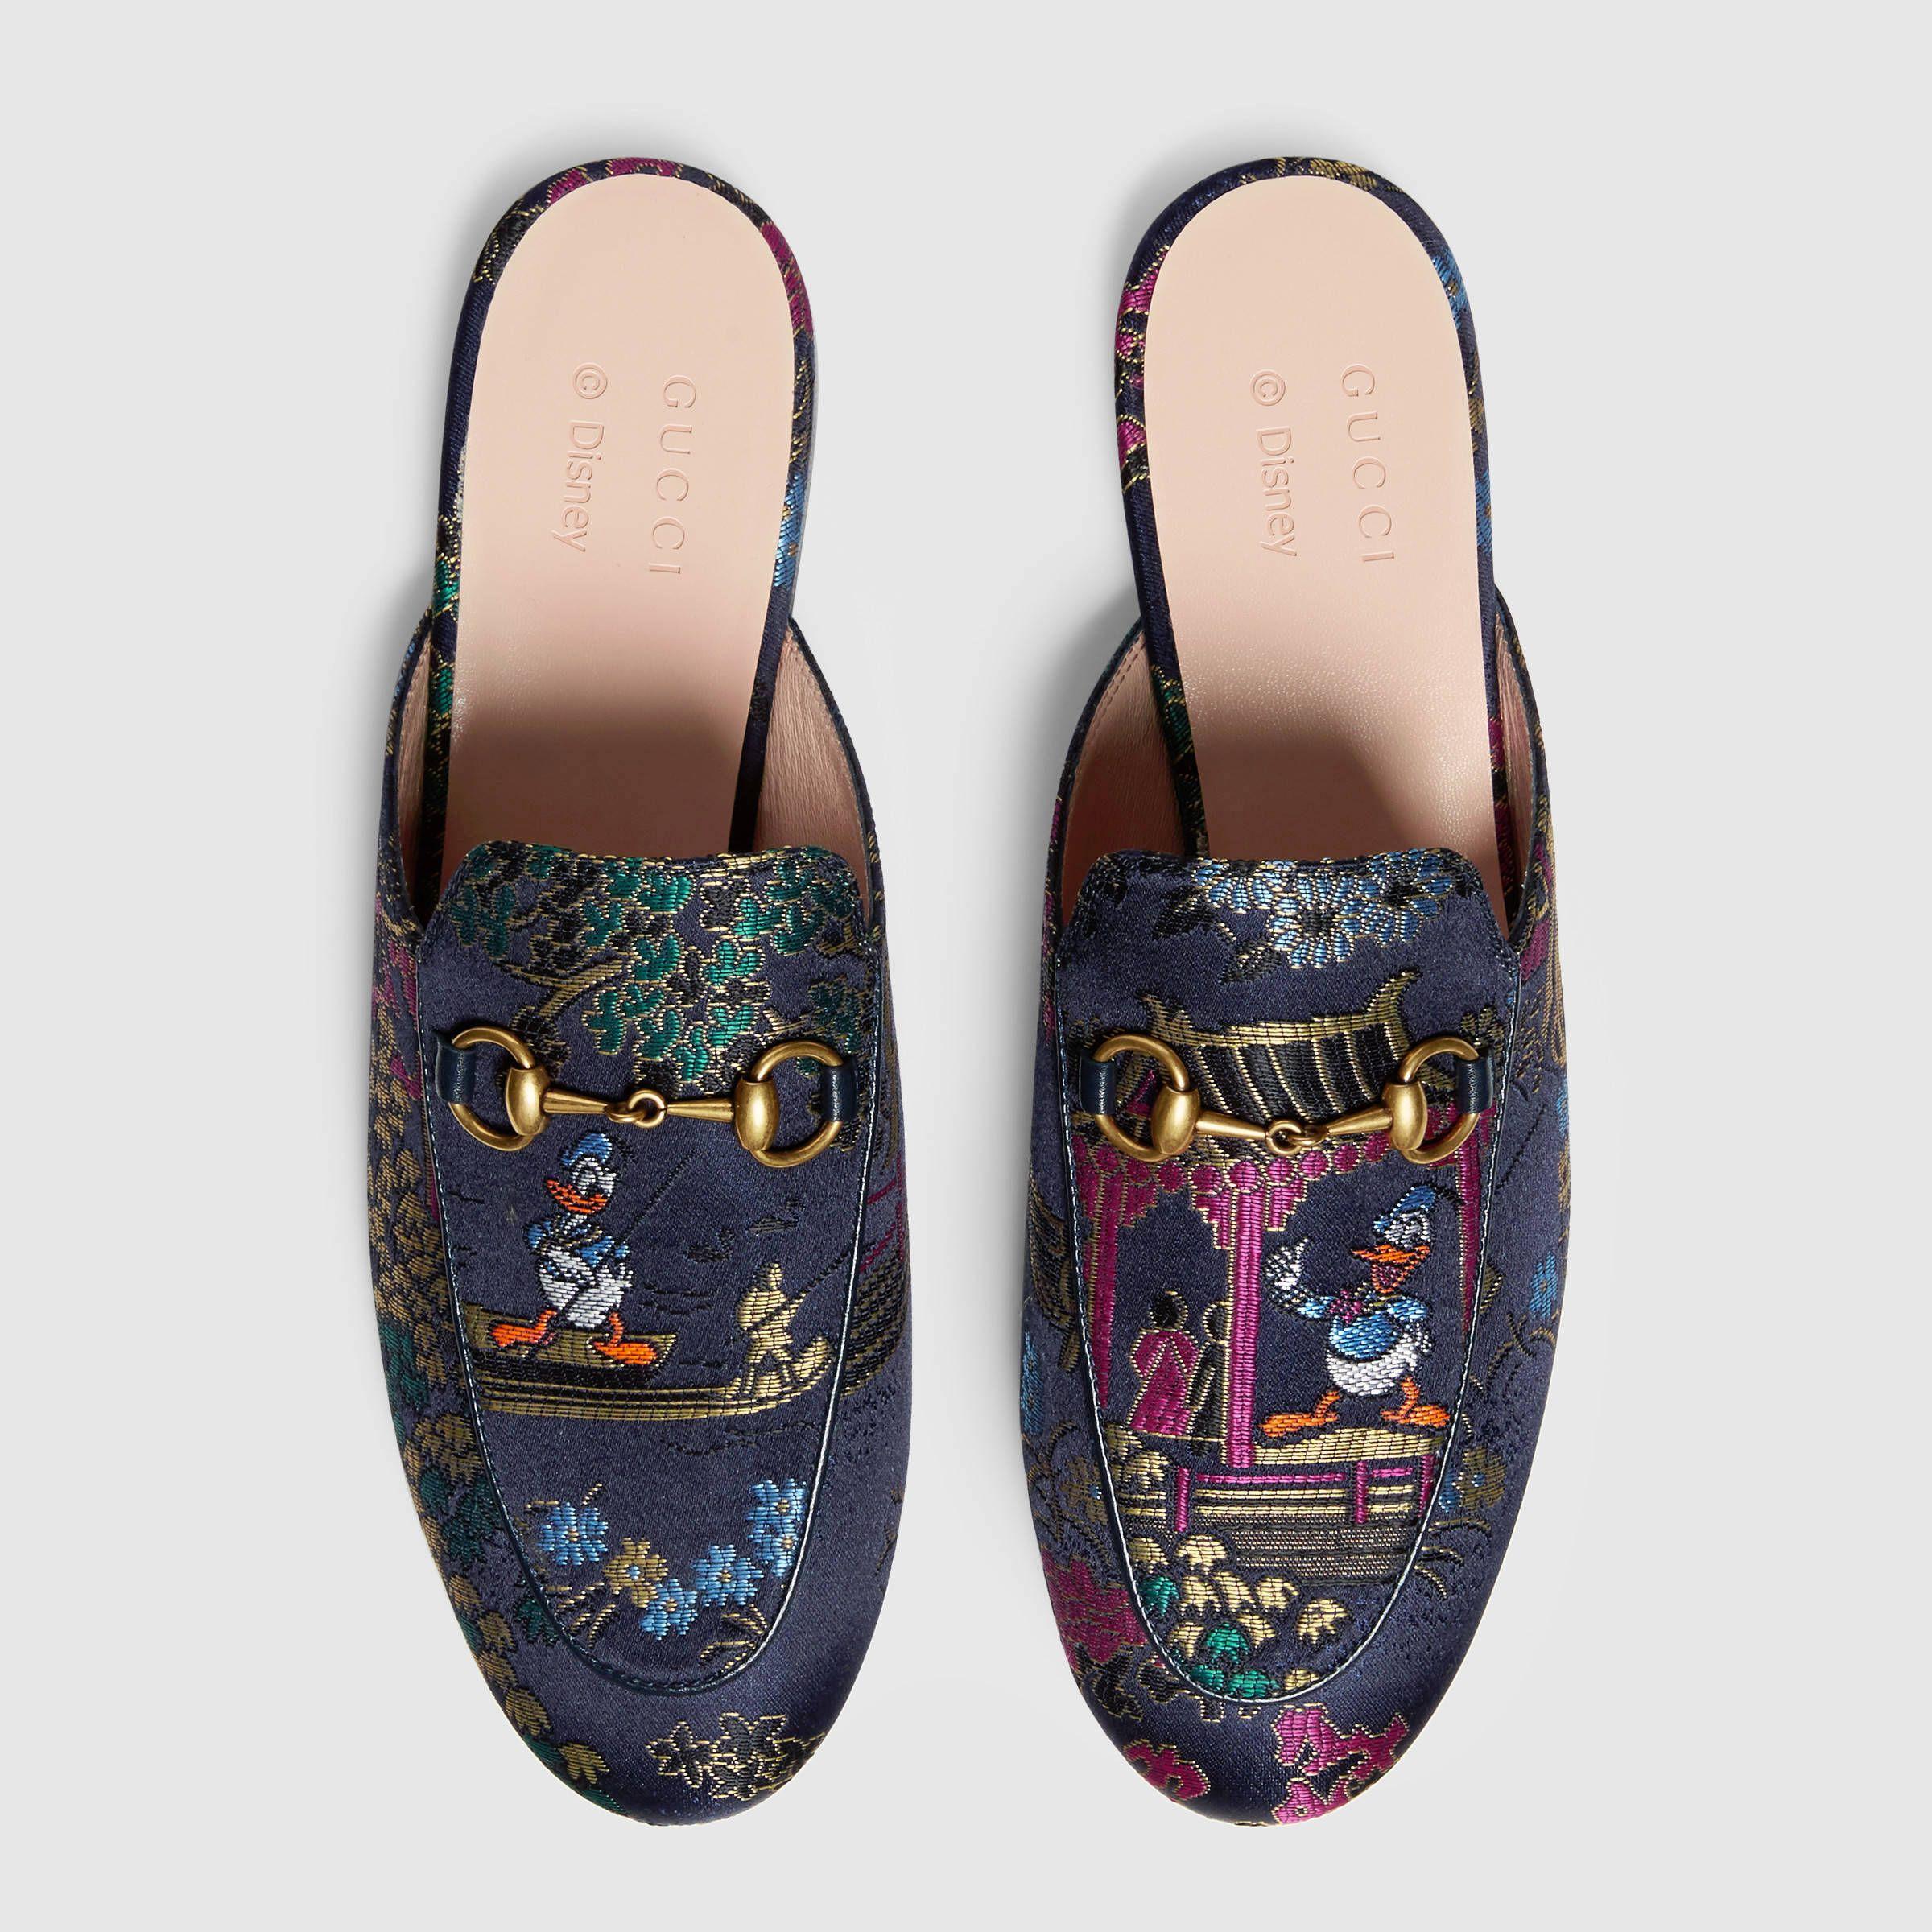 Gucci slipper, Disney